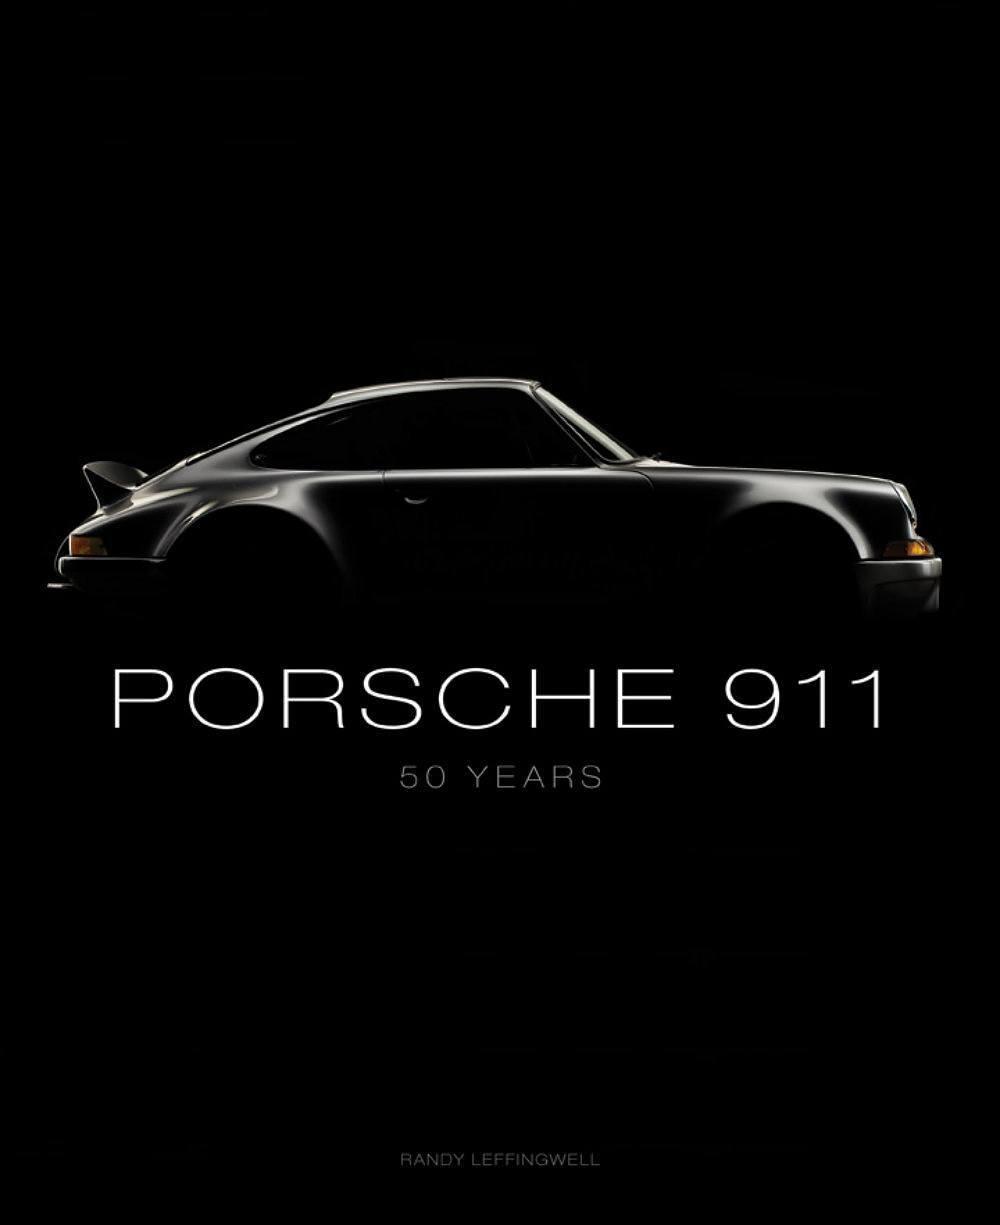 Porsche 911 50 Years Cover